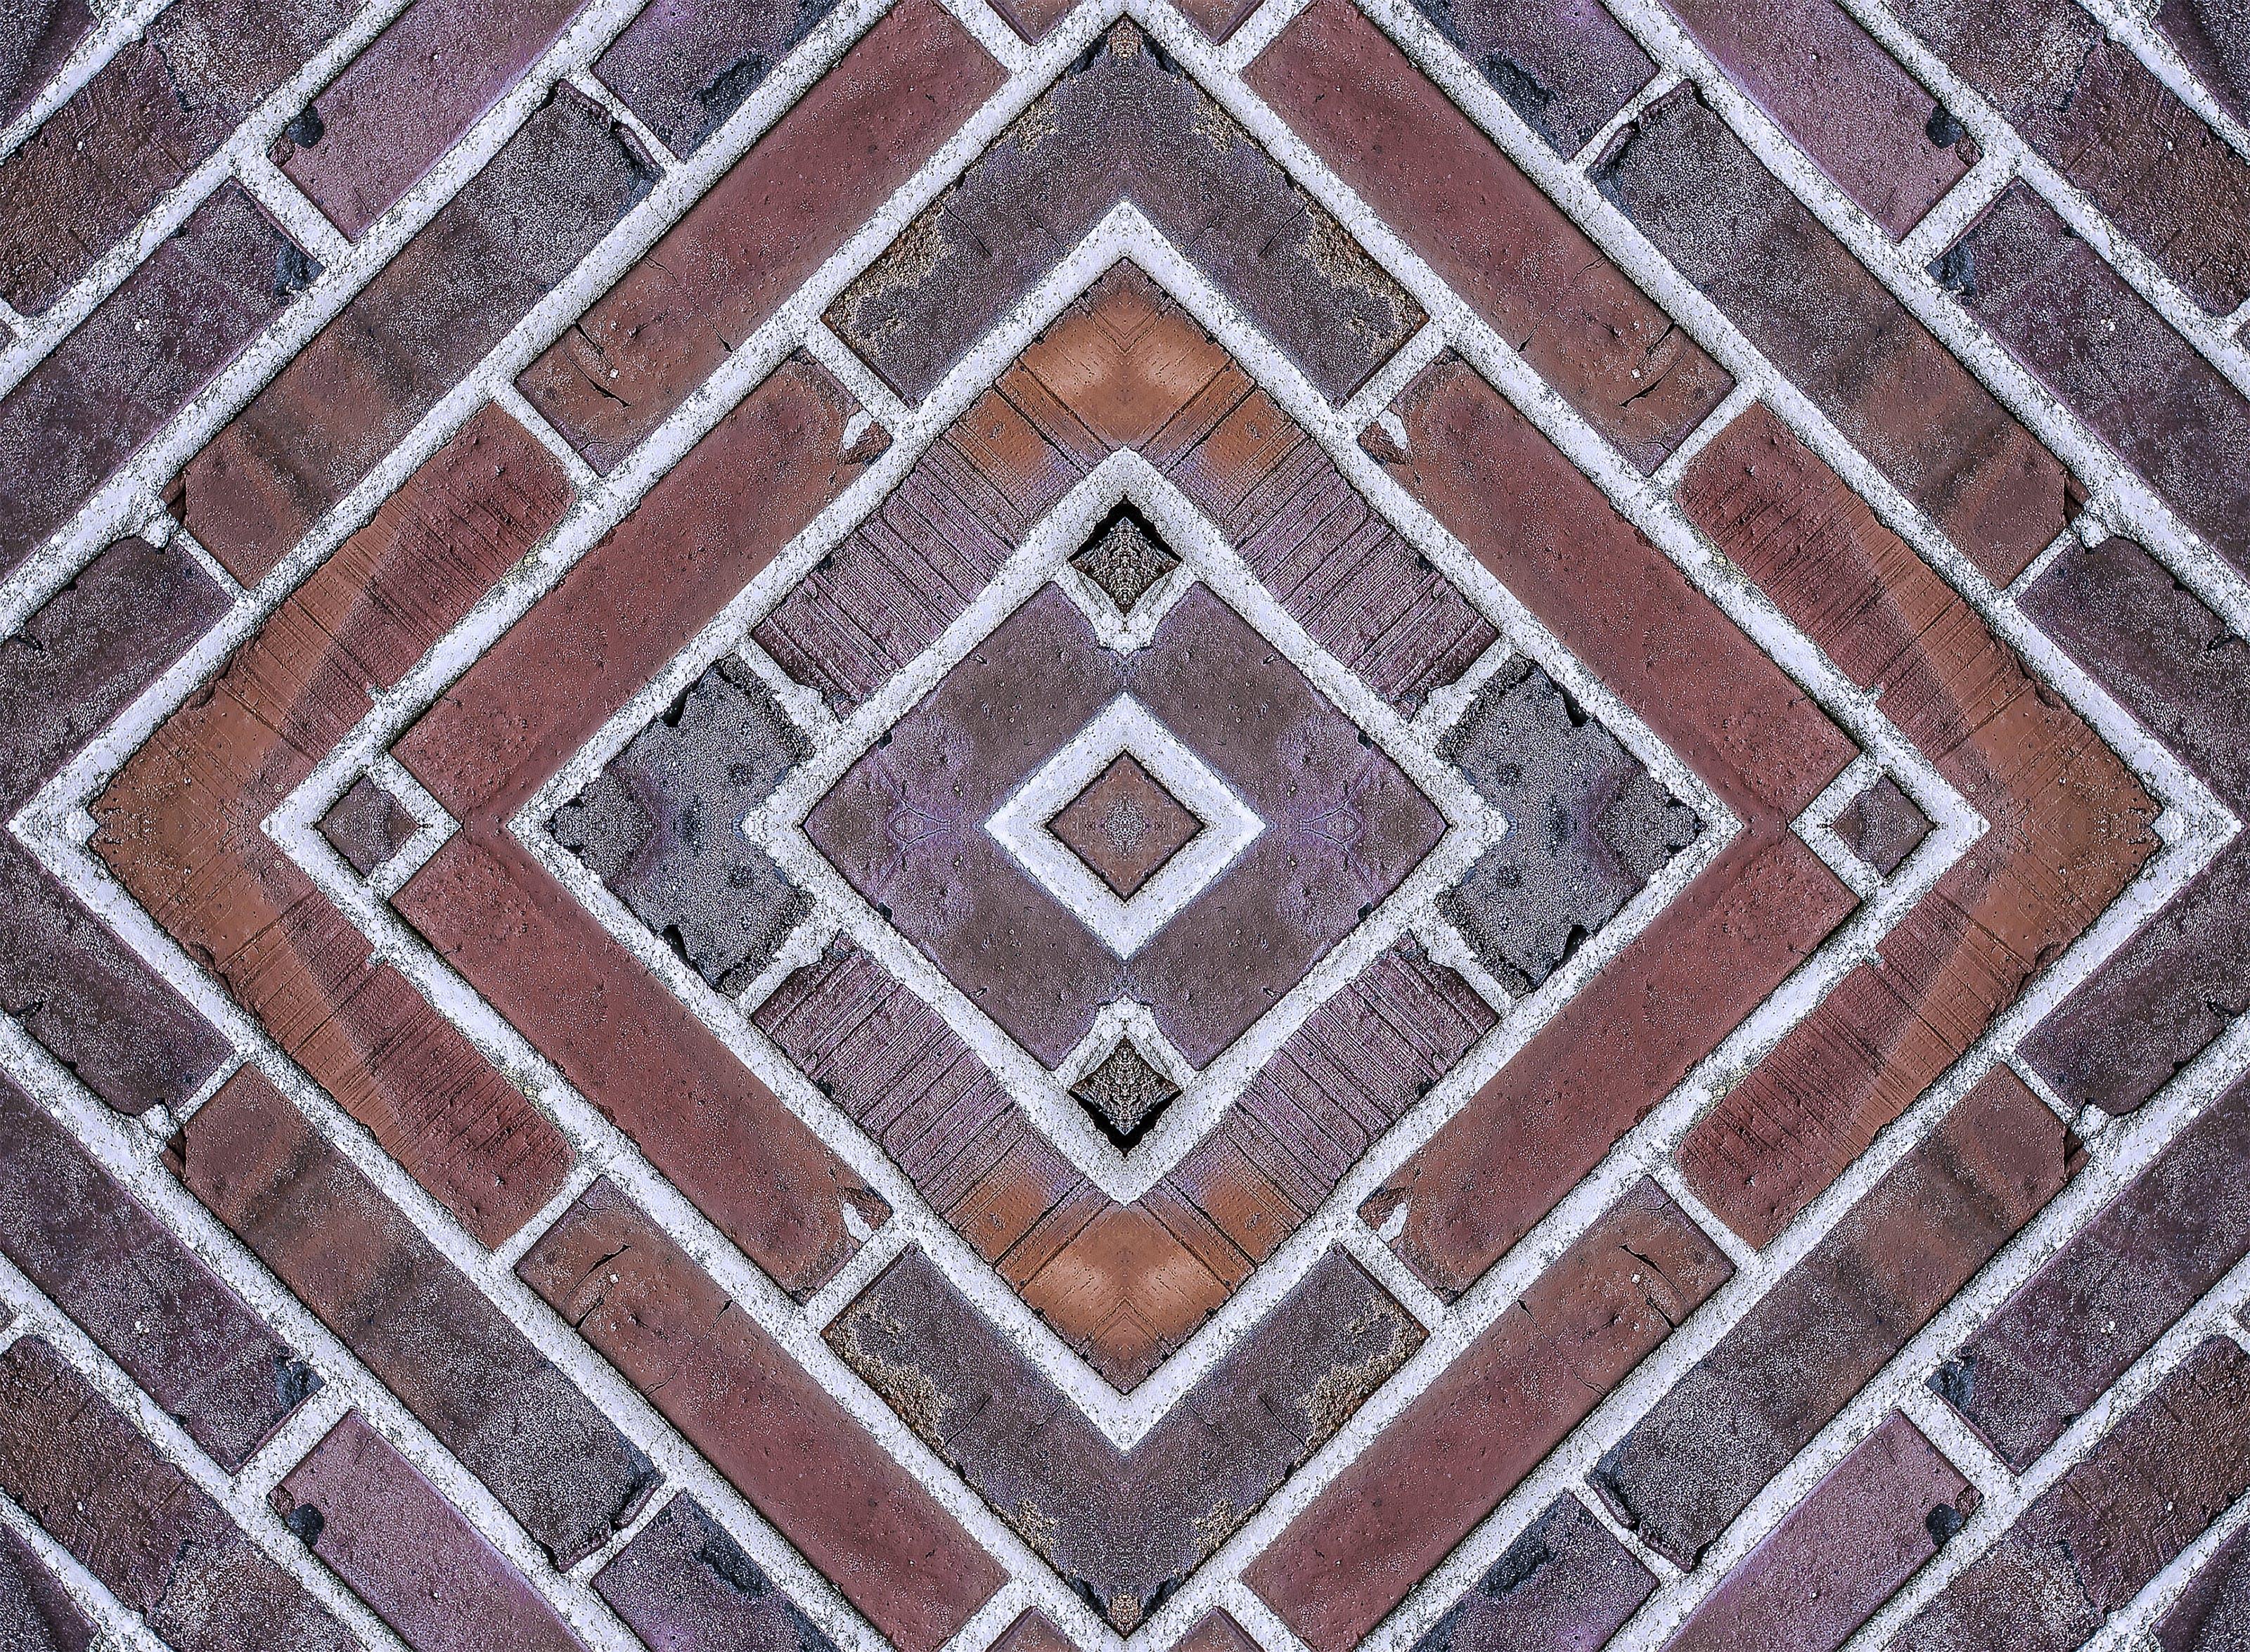 Free stock photo of background, brick wall, bricks